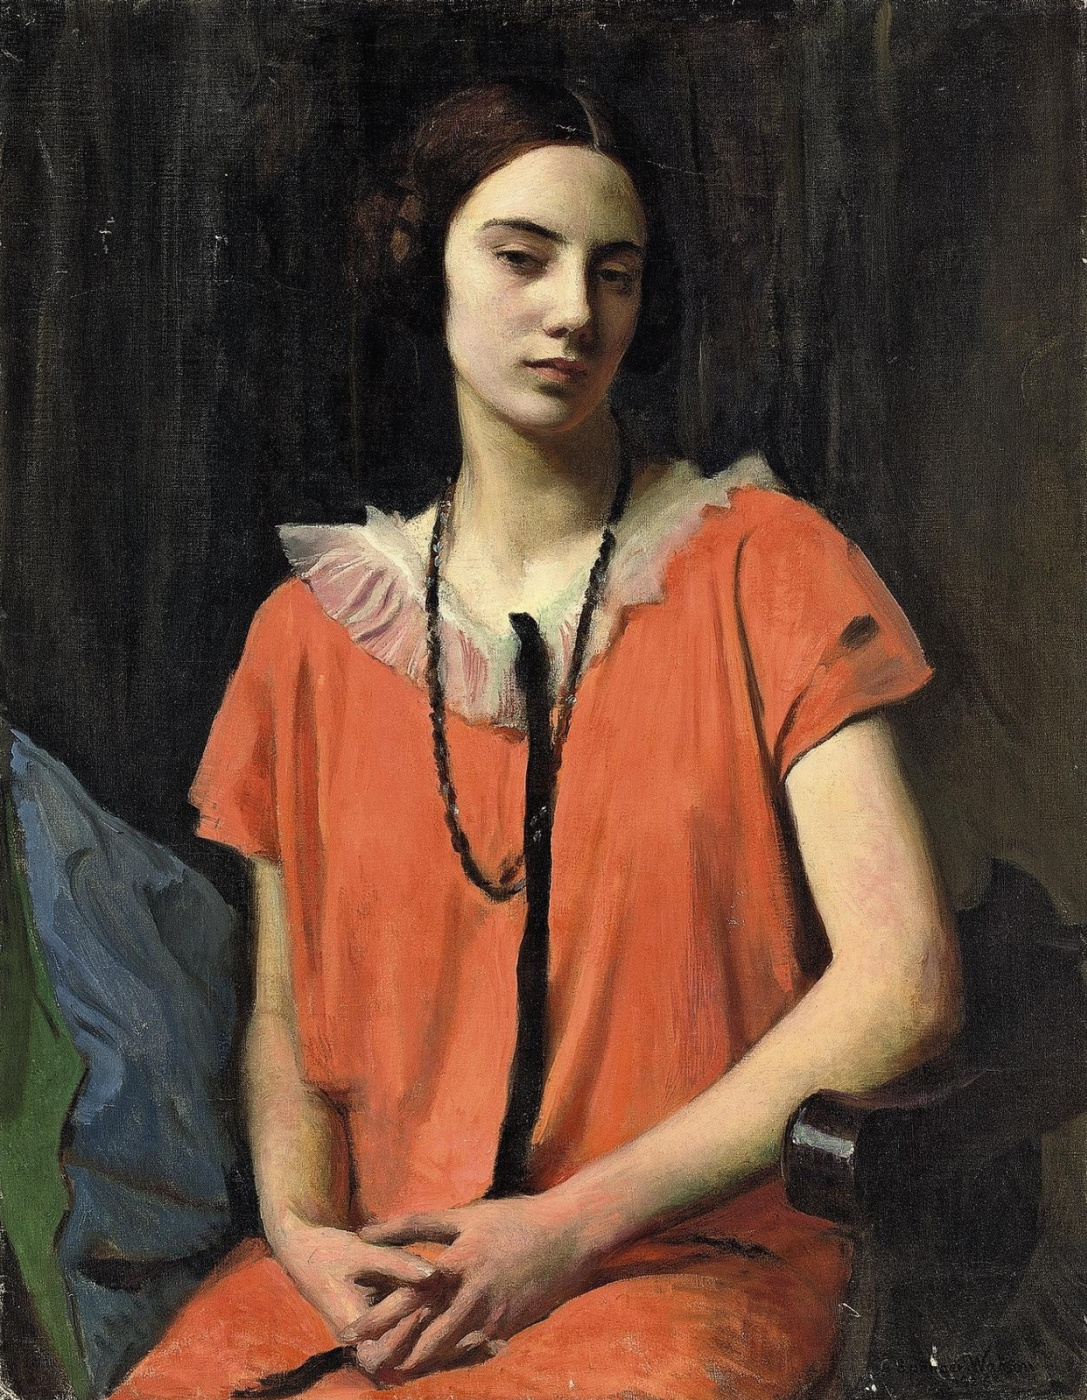 George Spencer Watson. Orange dress. 1926